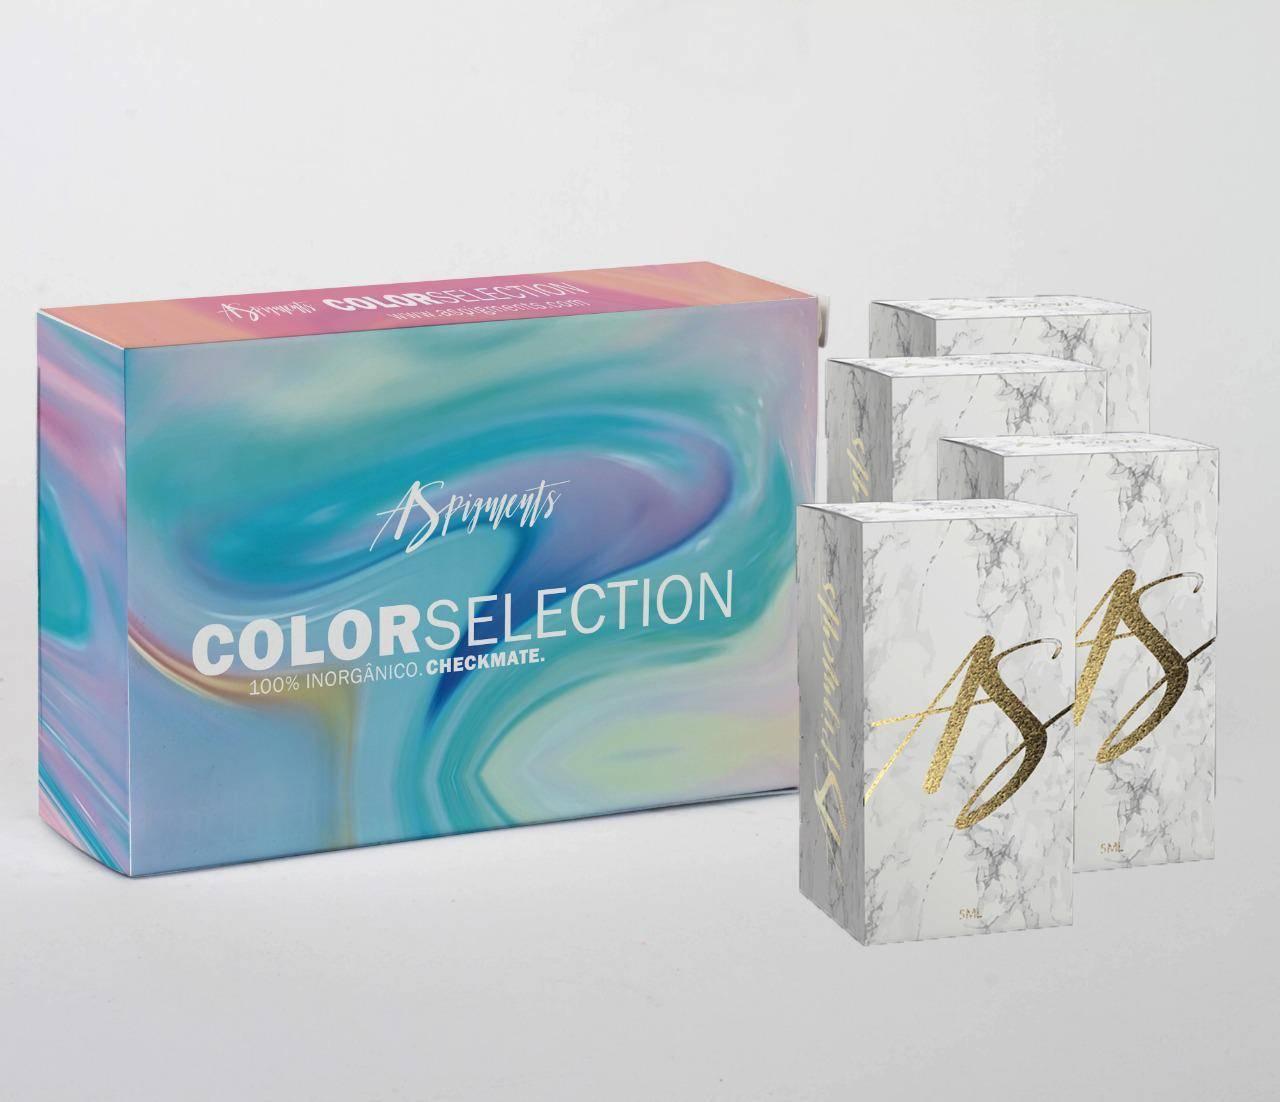 KIT COLOR SELECTION 2 -contém 4 frascos de 5 ml - Loja Ana Paulla